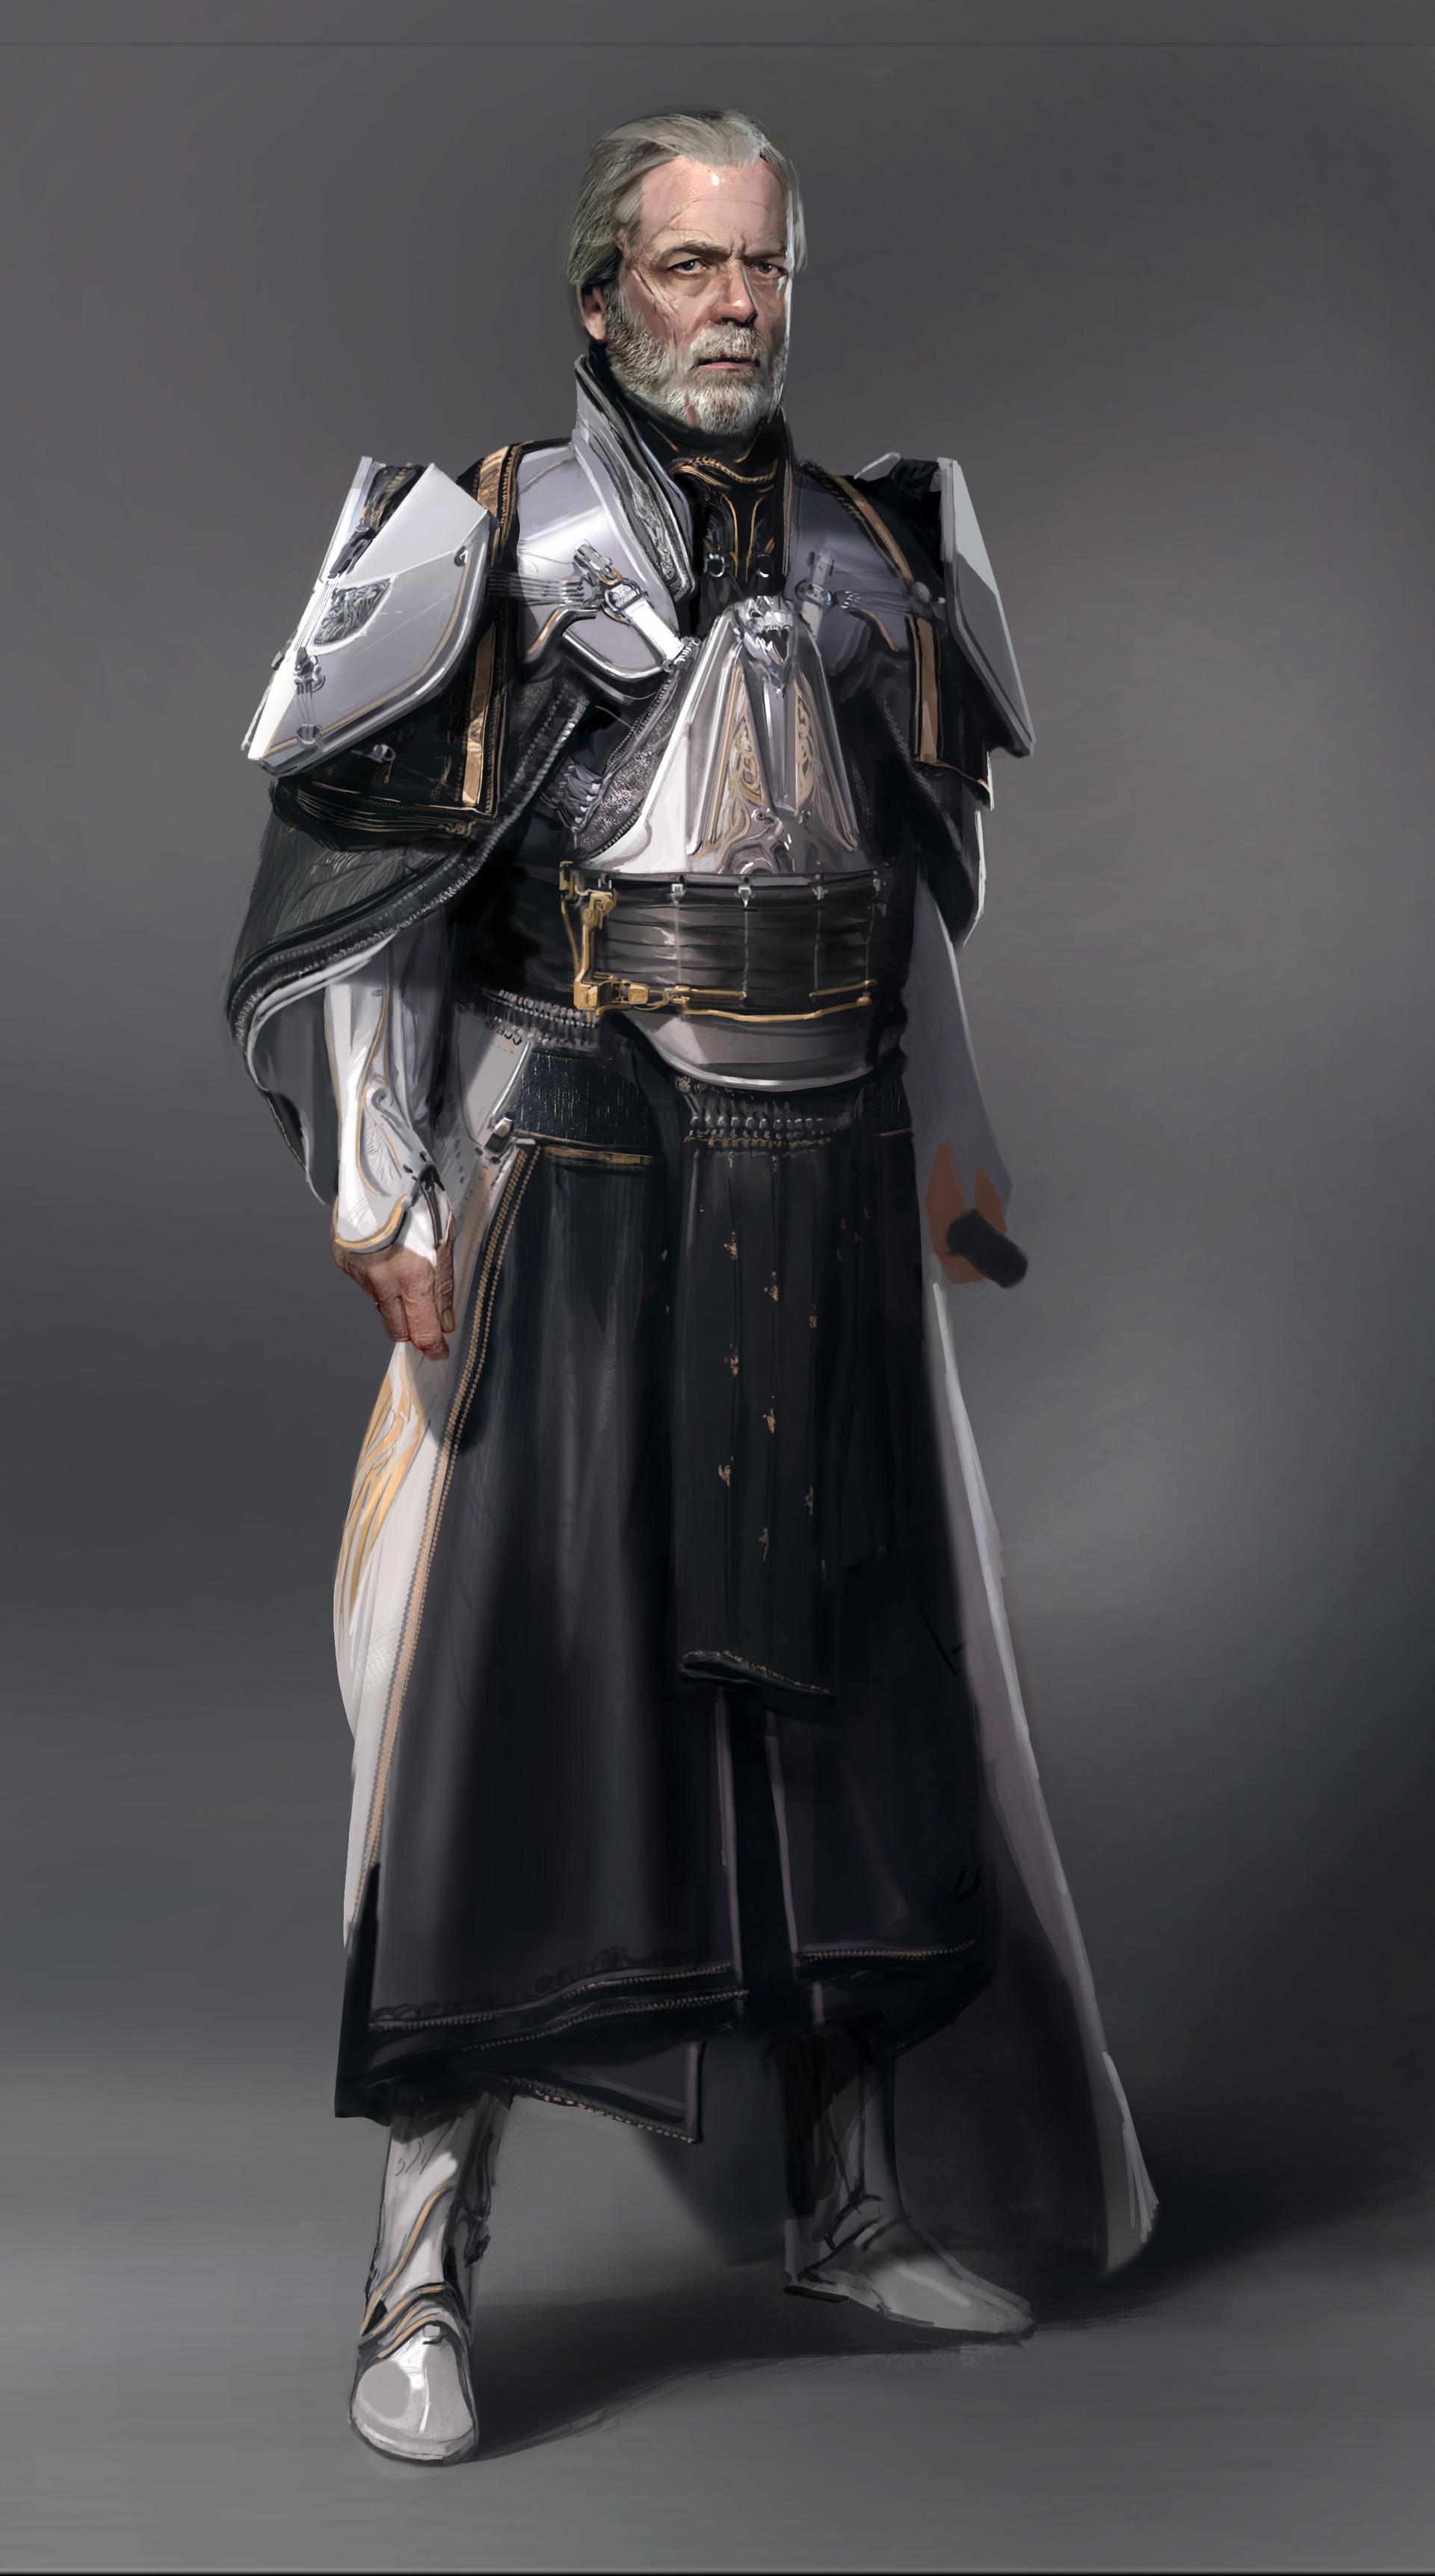 Emperor valkorian concept